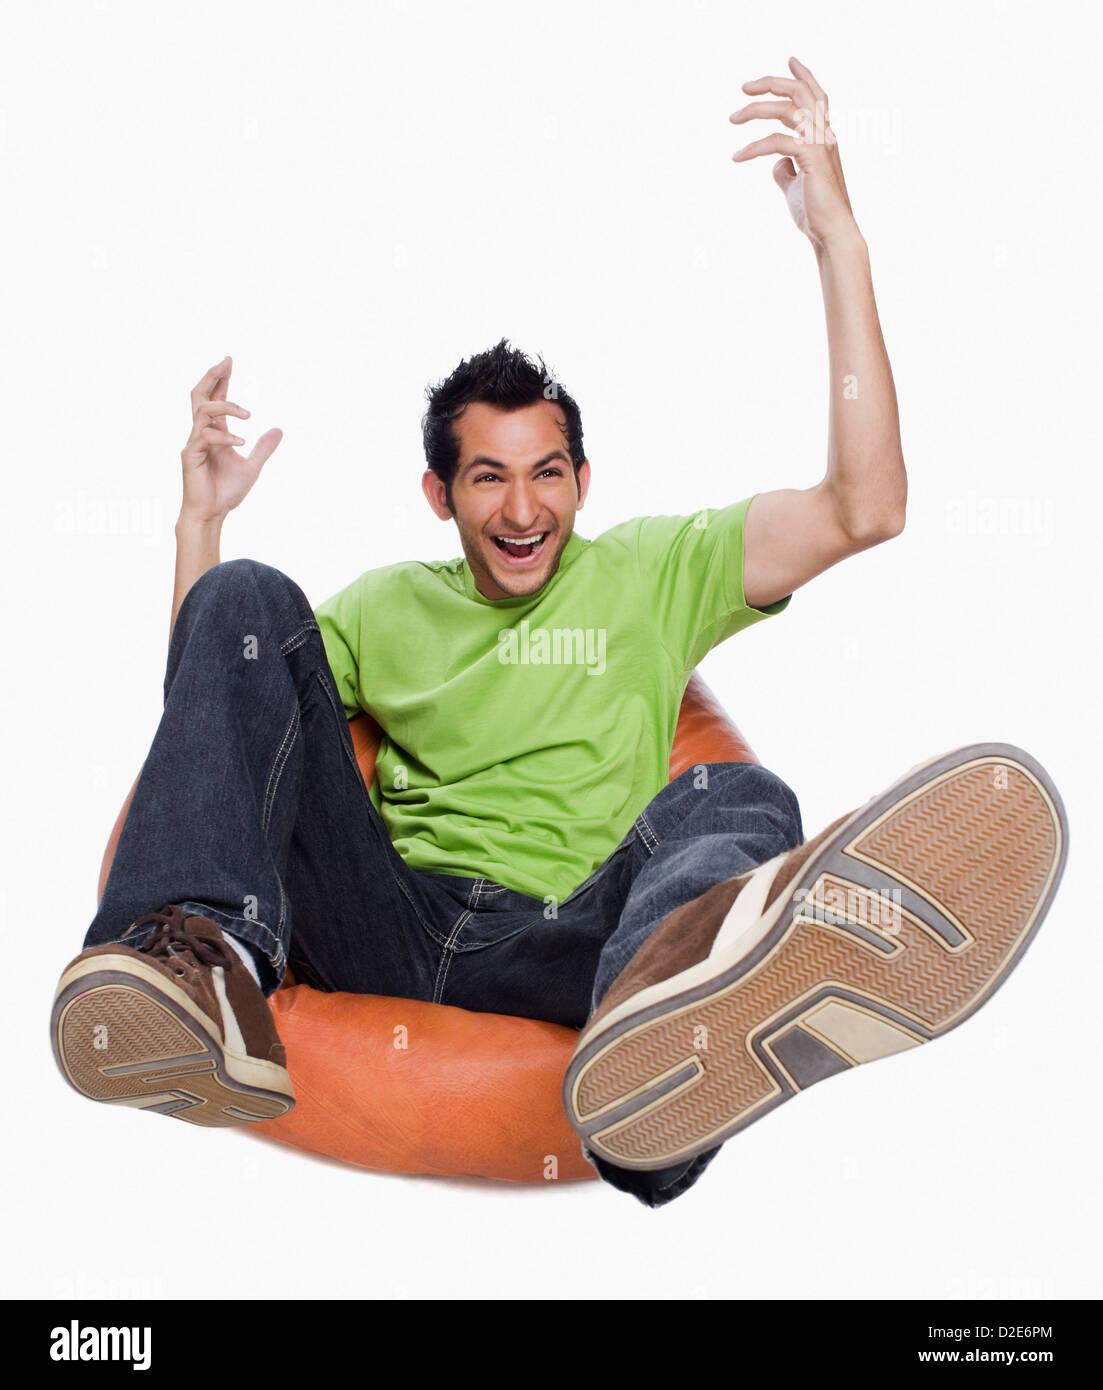 Man cheering on a bean bag - Stock Image